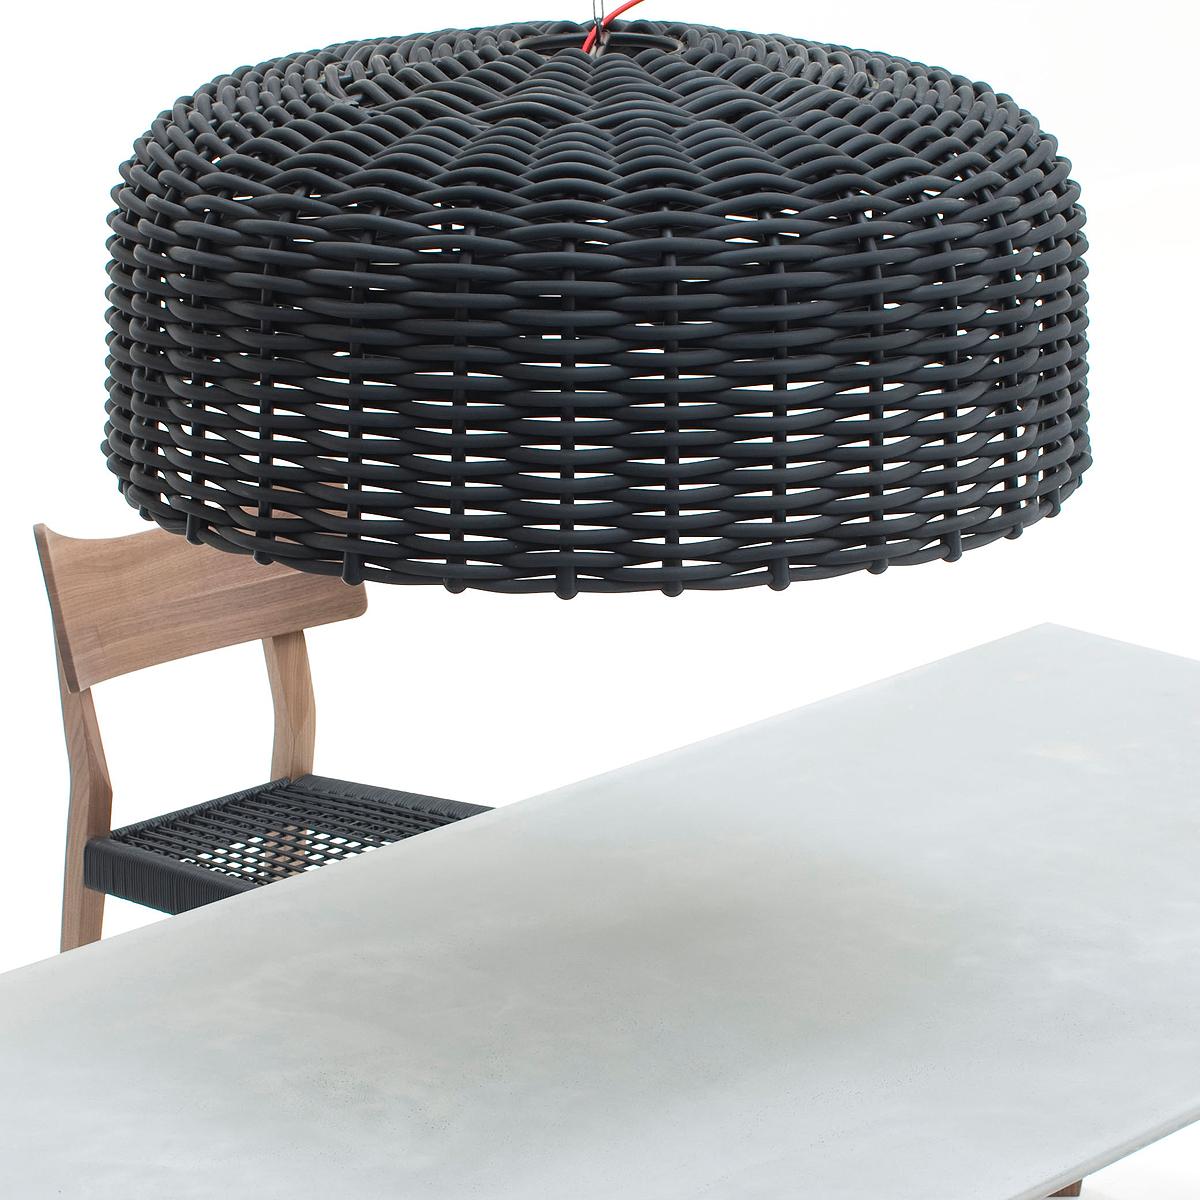 gervasoni sweet - Suspension lamp woven with matt black or glossy white PVC, 18 W, 220 Volt.